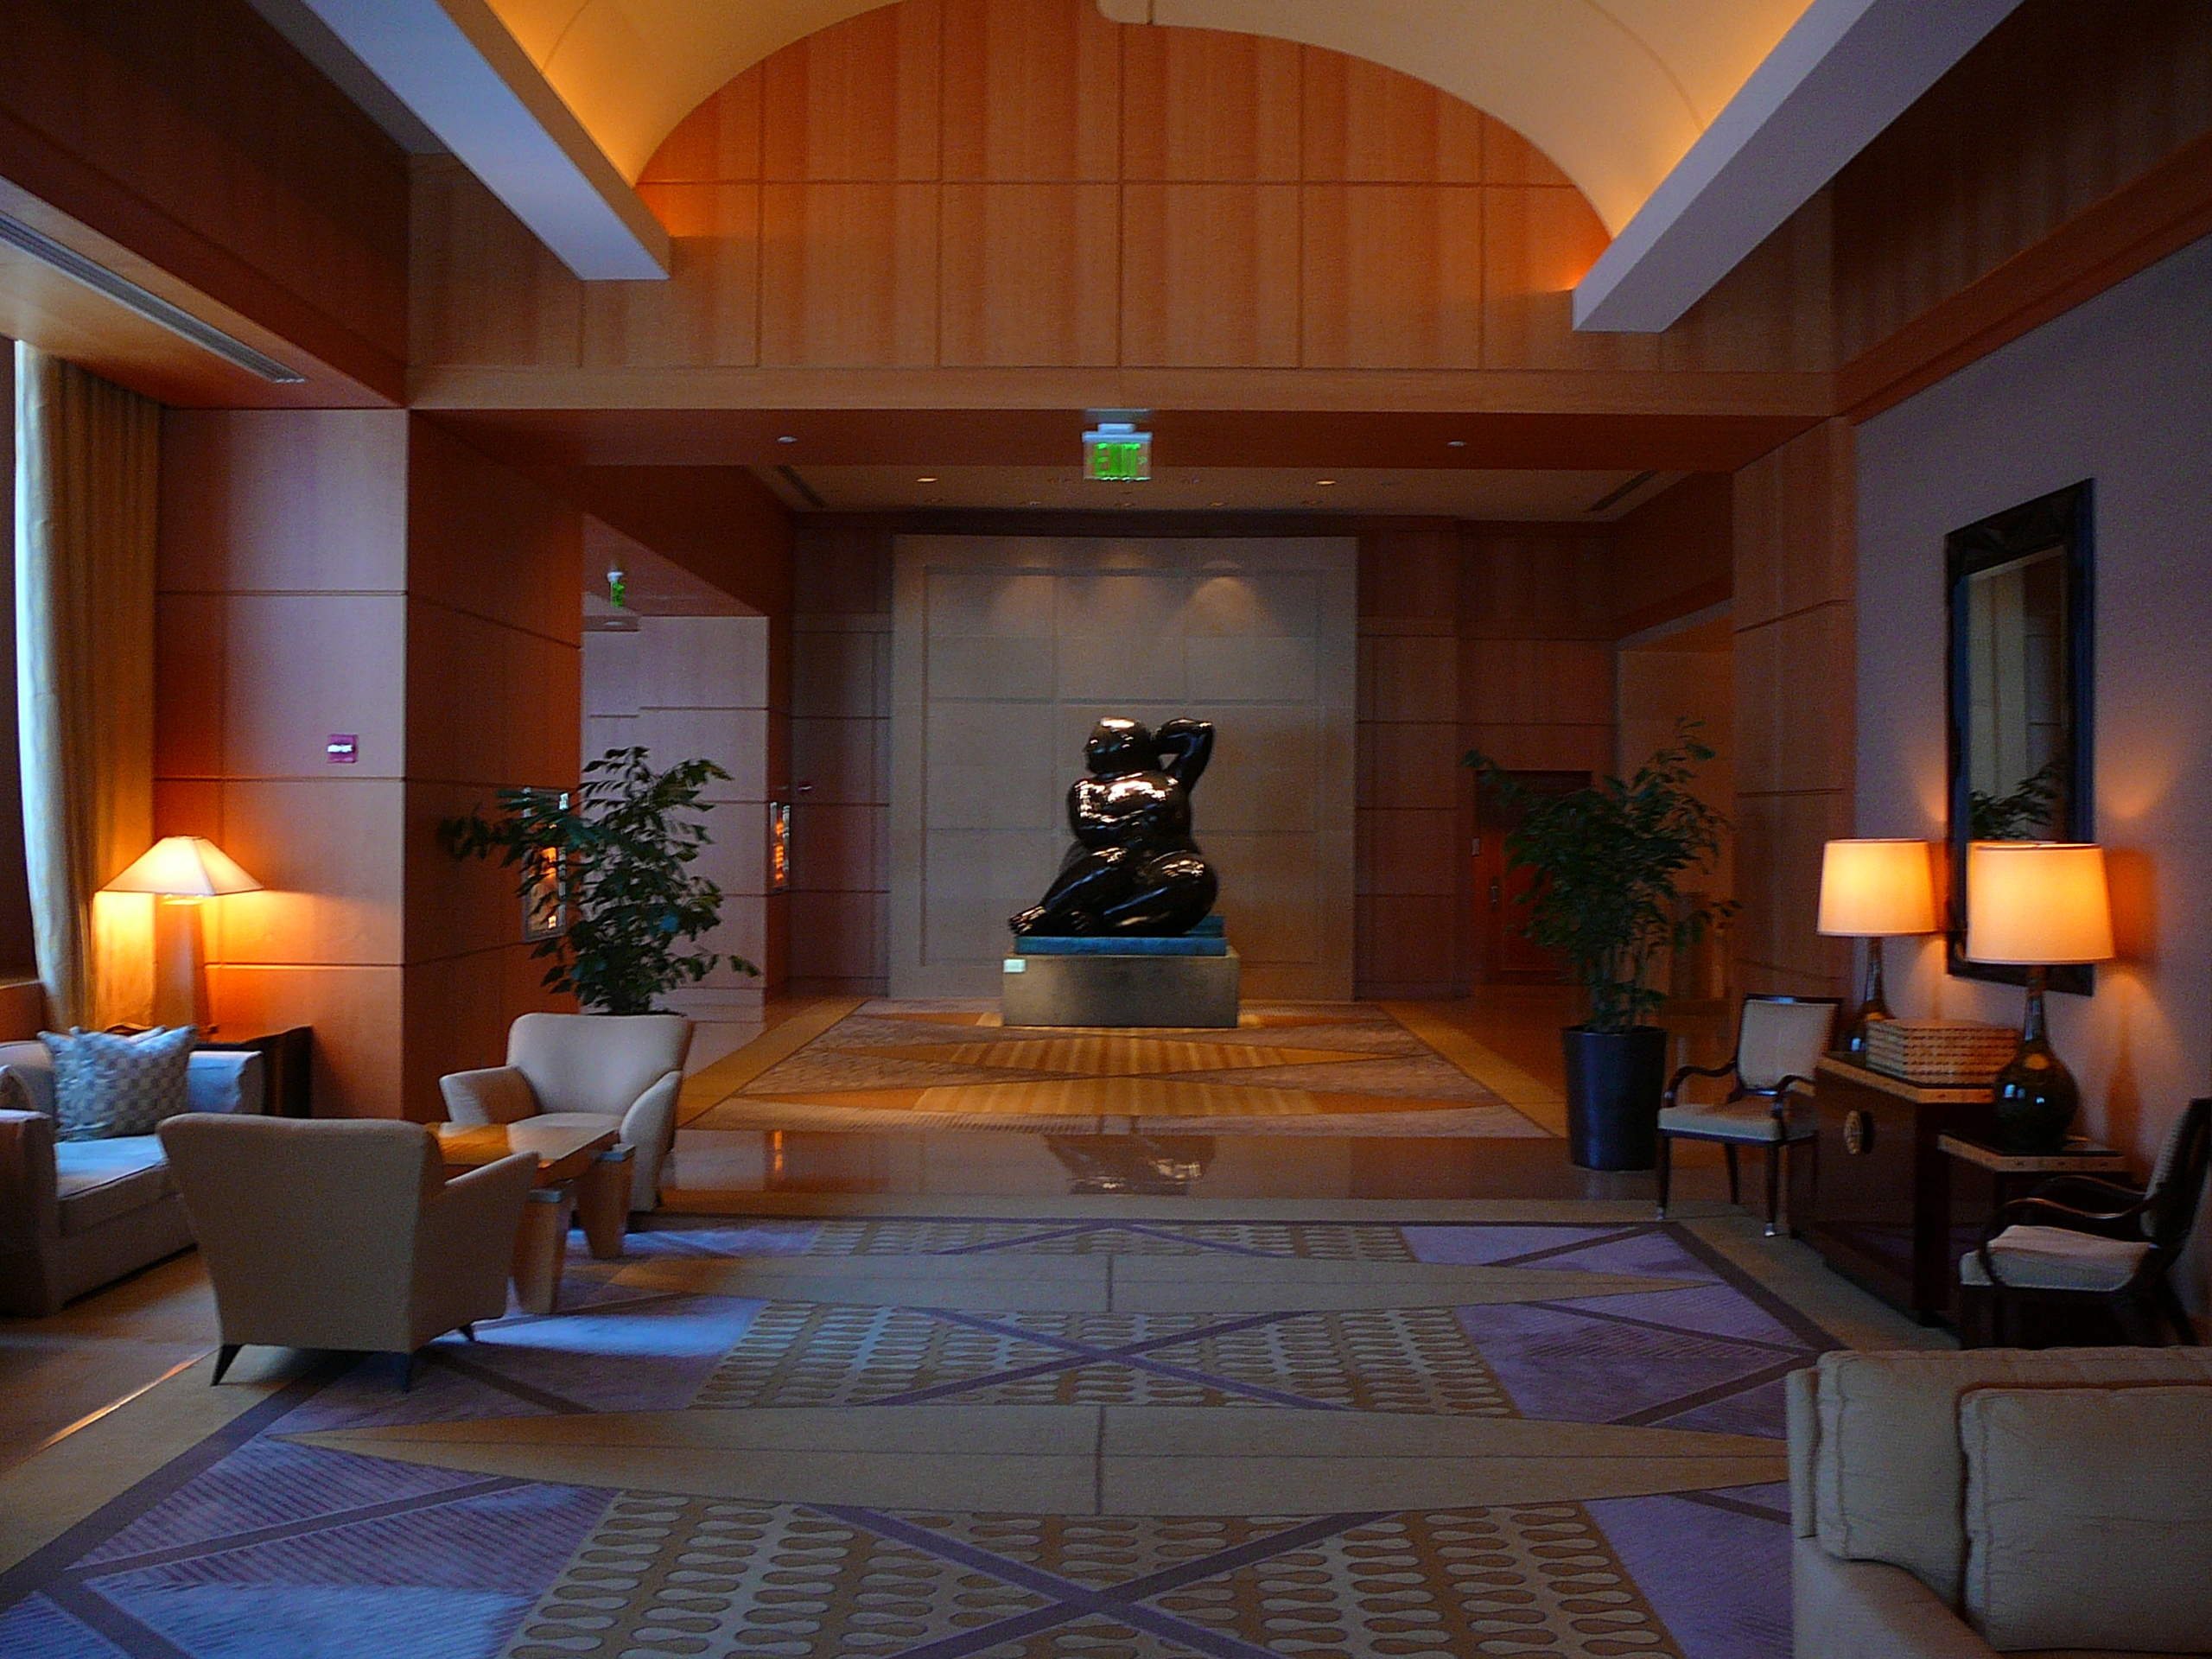 Four Seasons Hotel and Resort Lobby